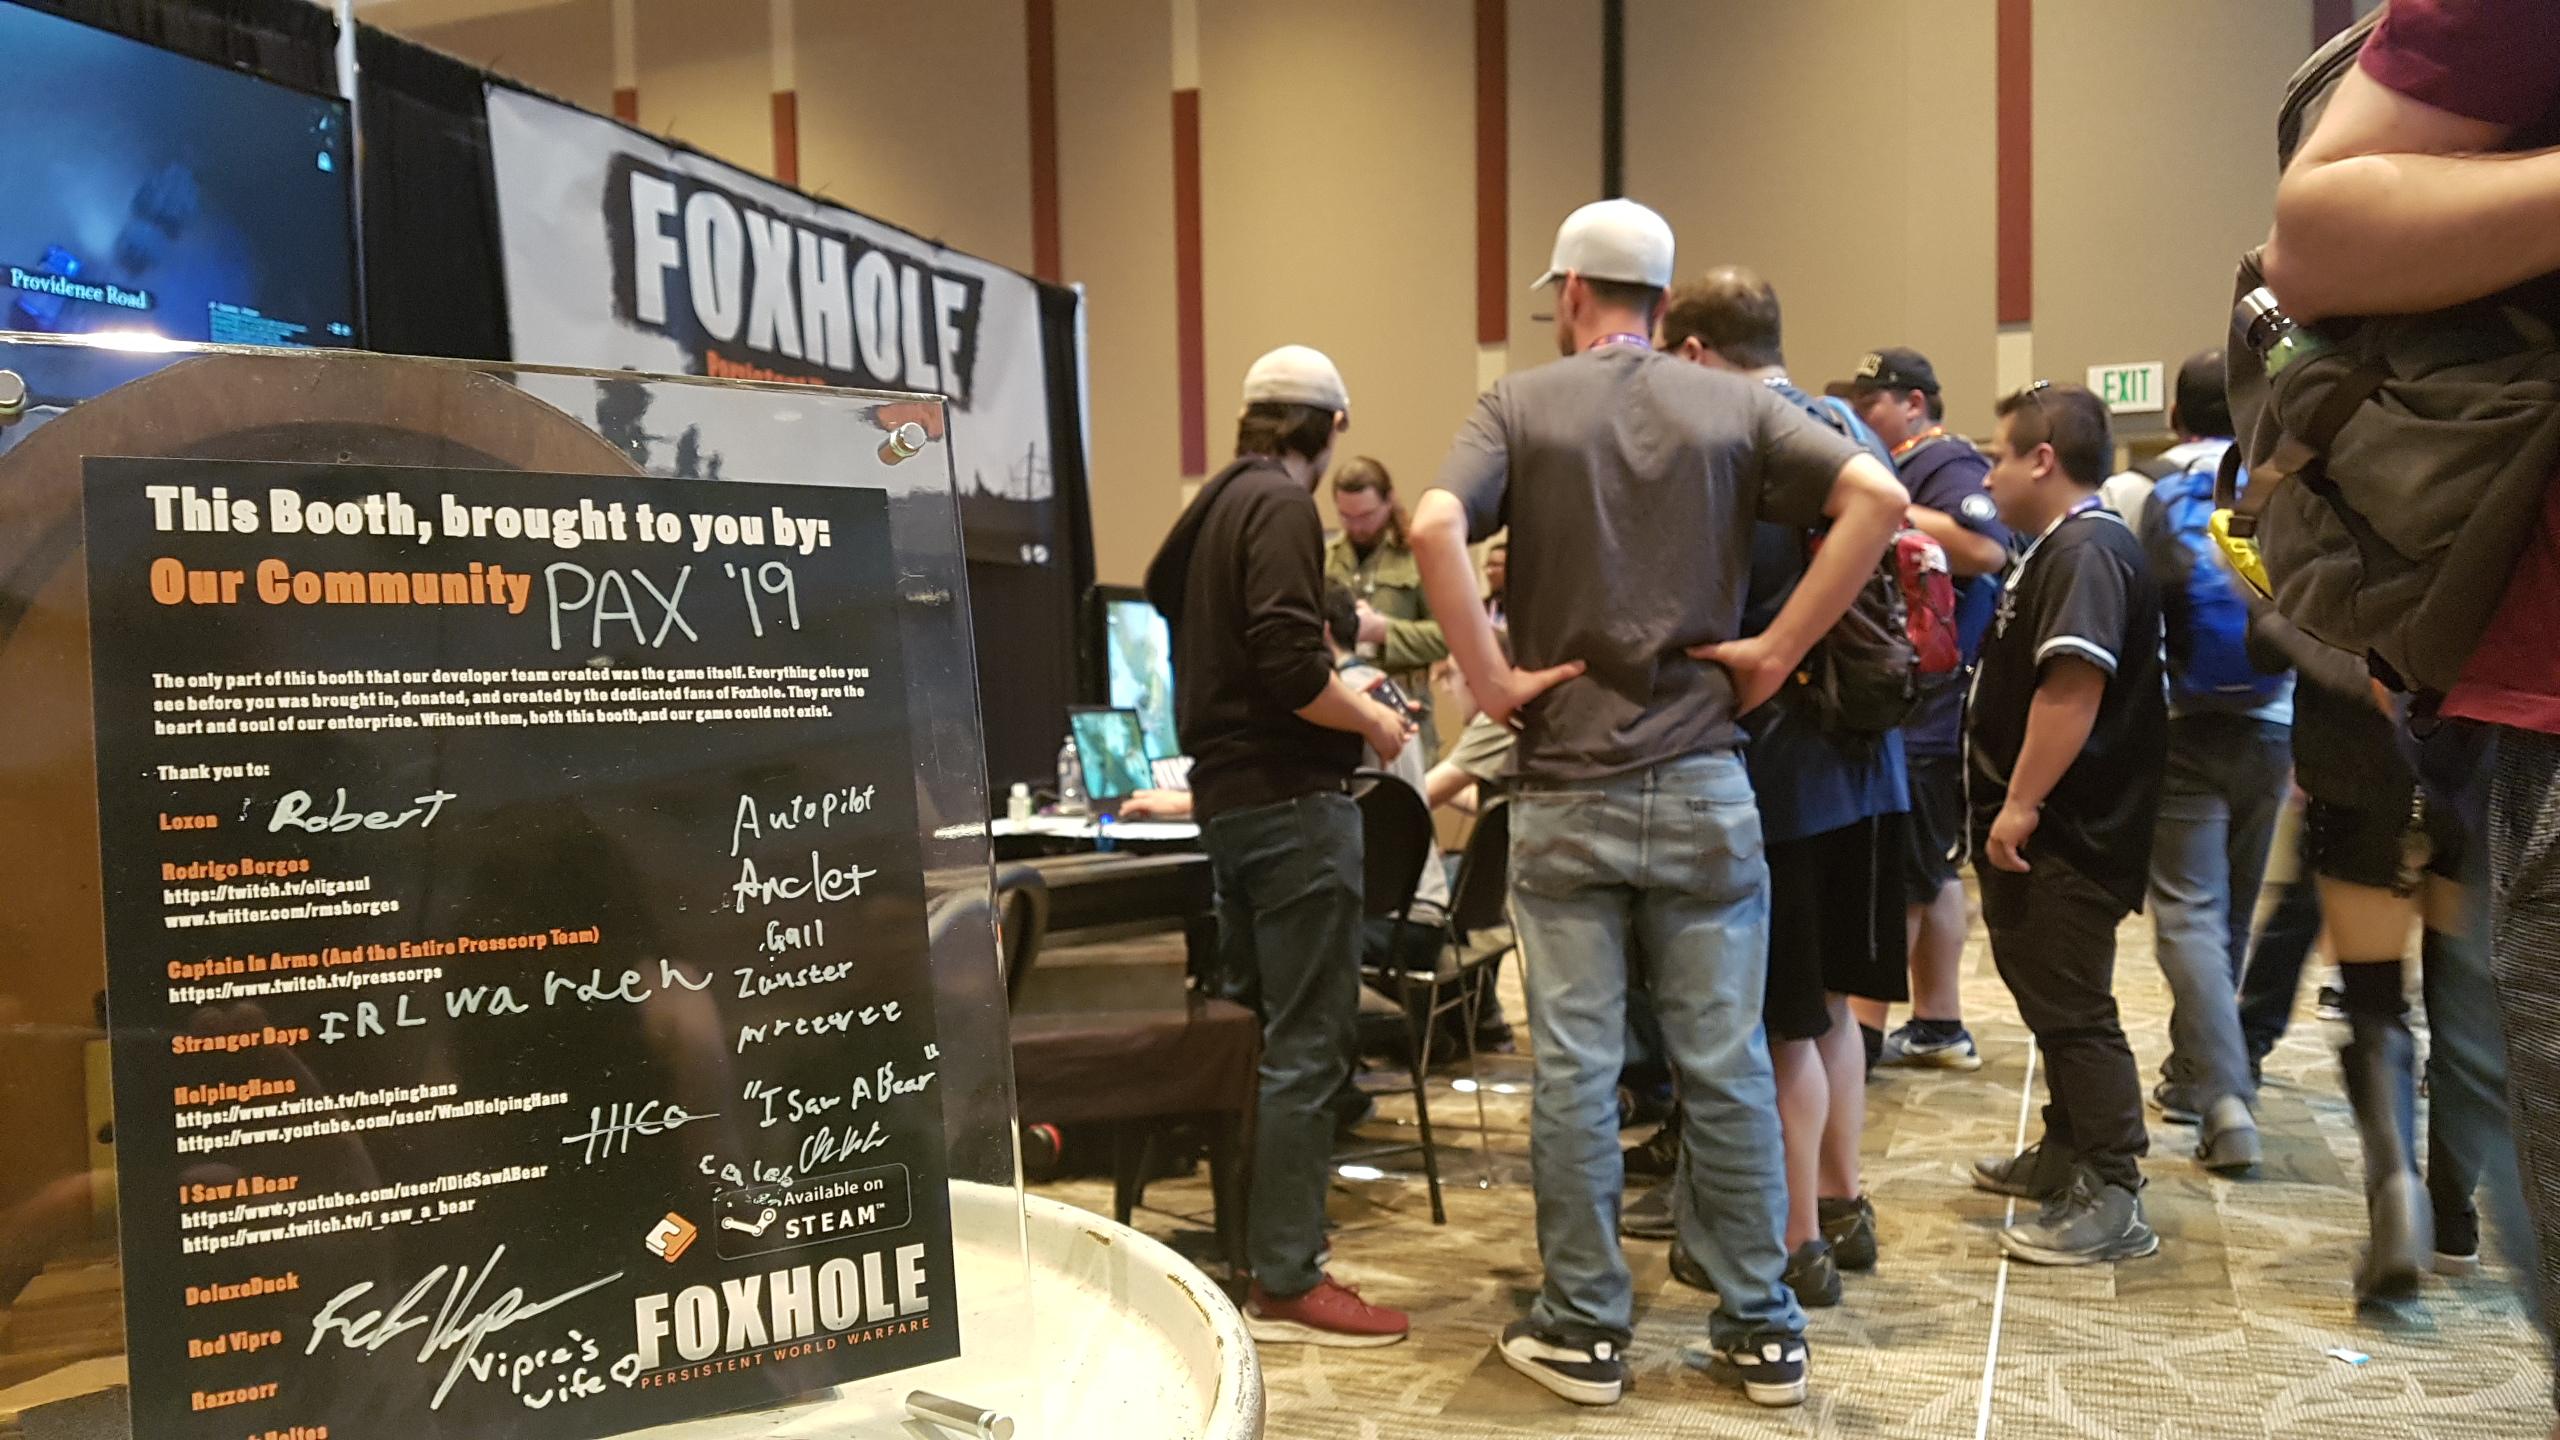 Foxhole Windows game